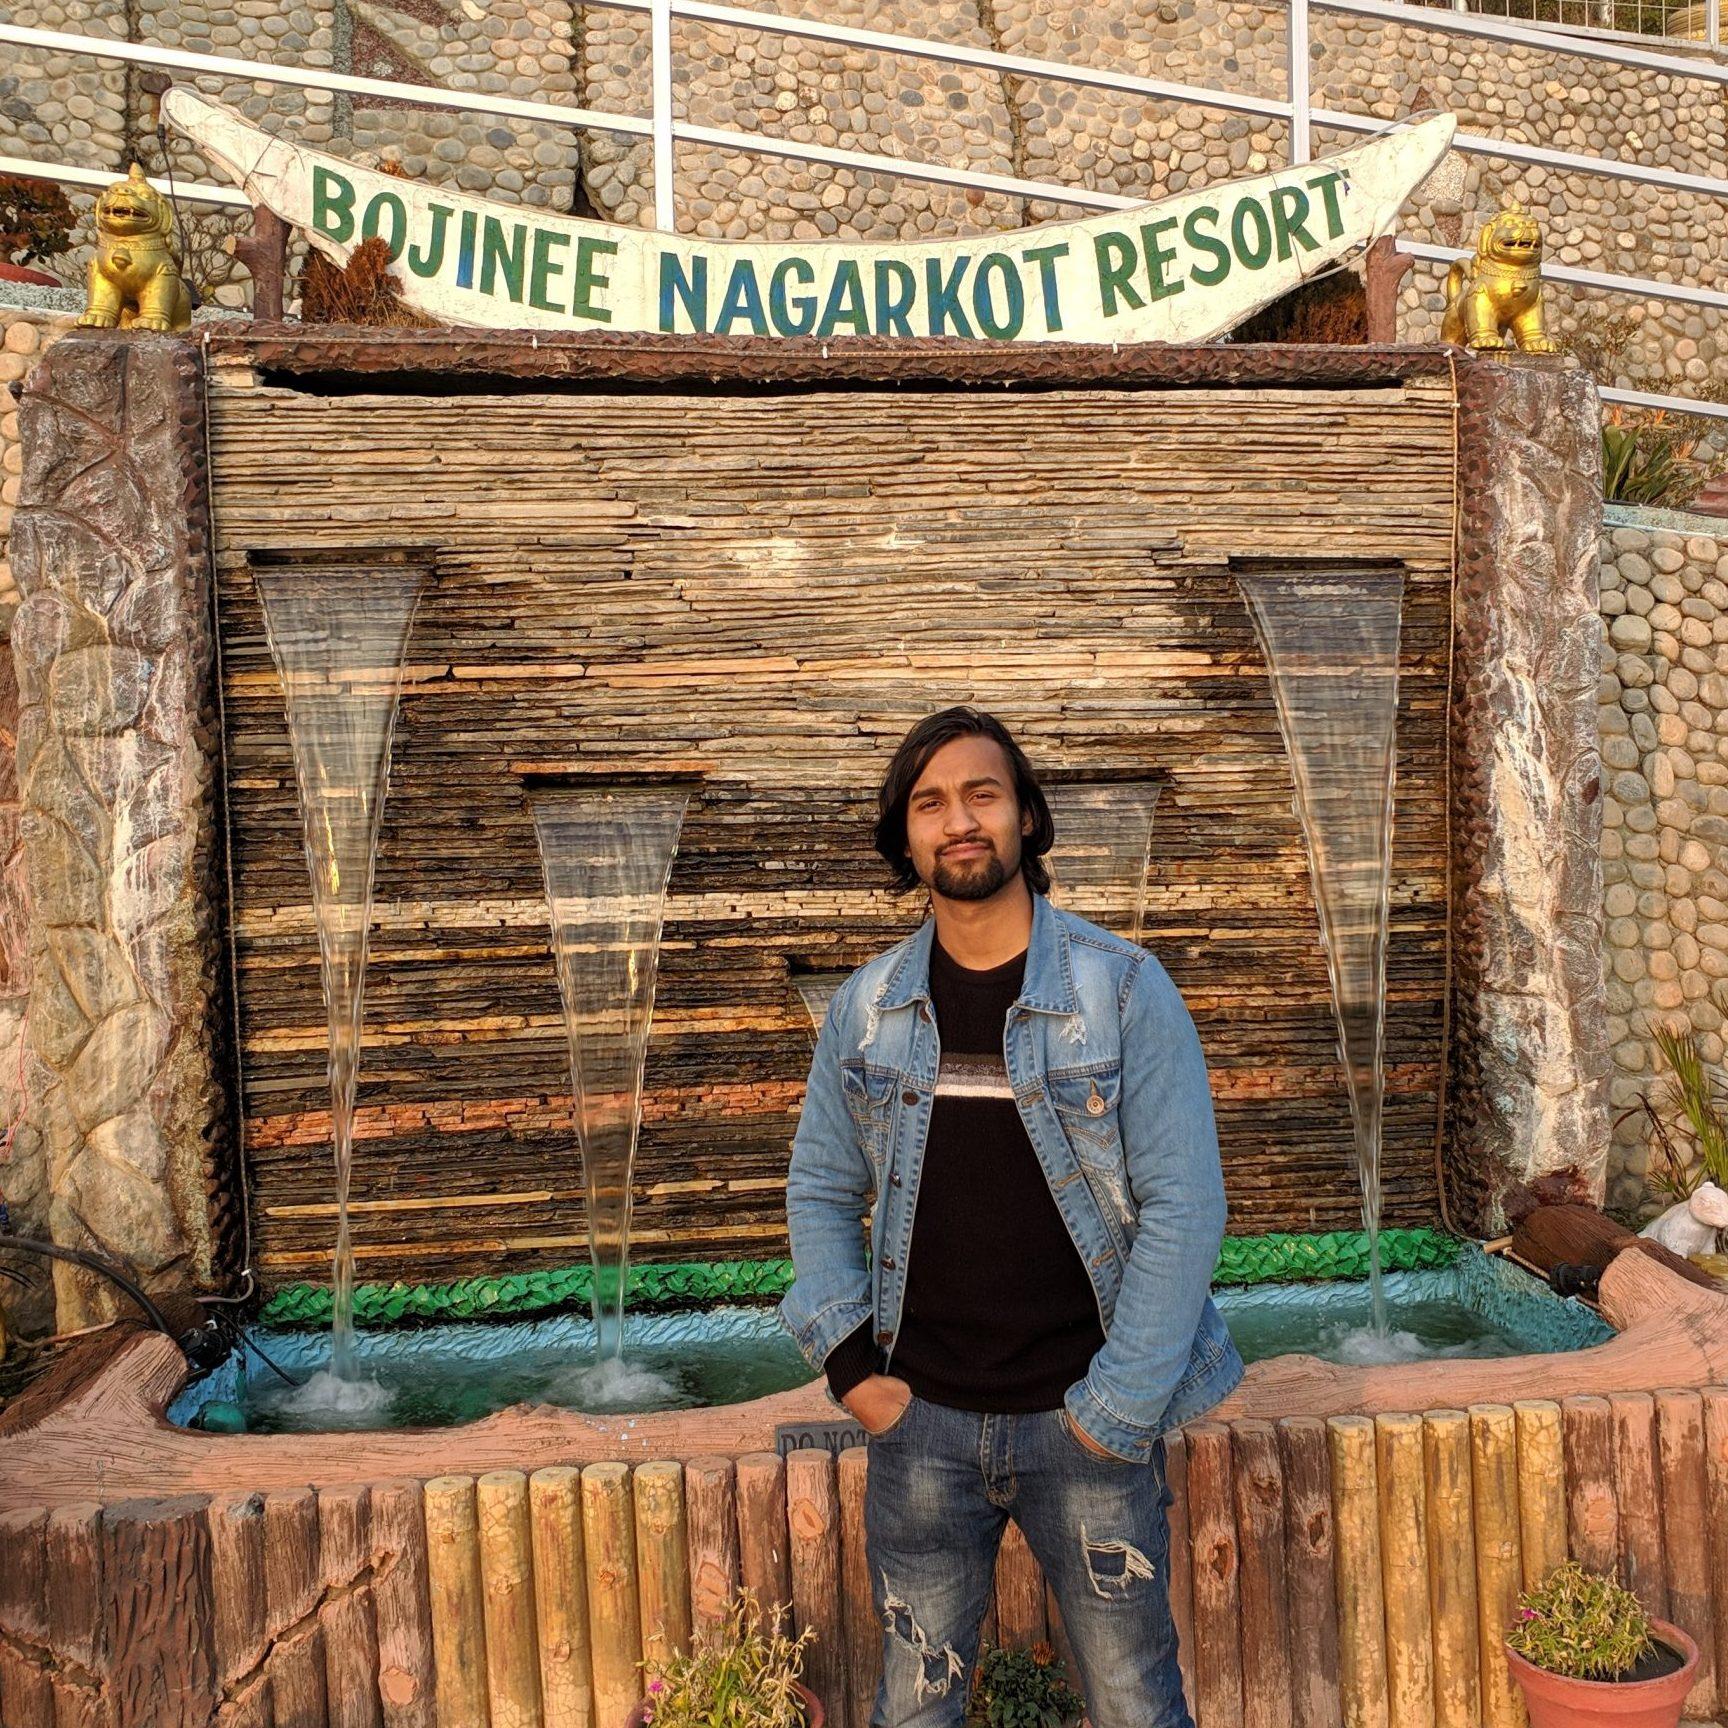 bojinee nagarkot resort